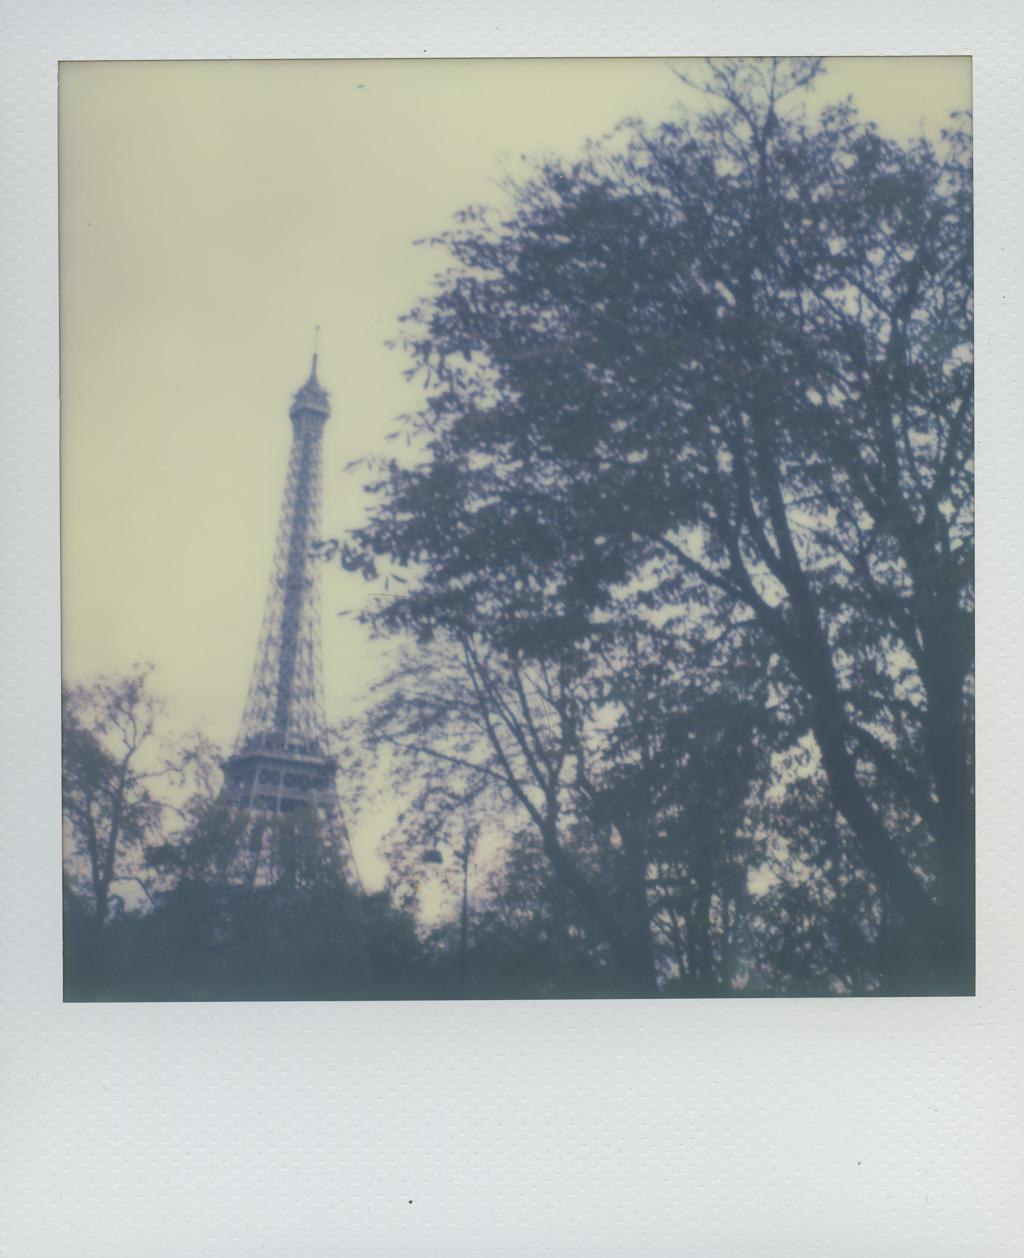 Paris tour eiffel006.jpg